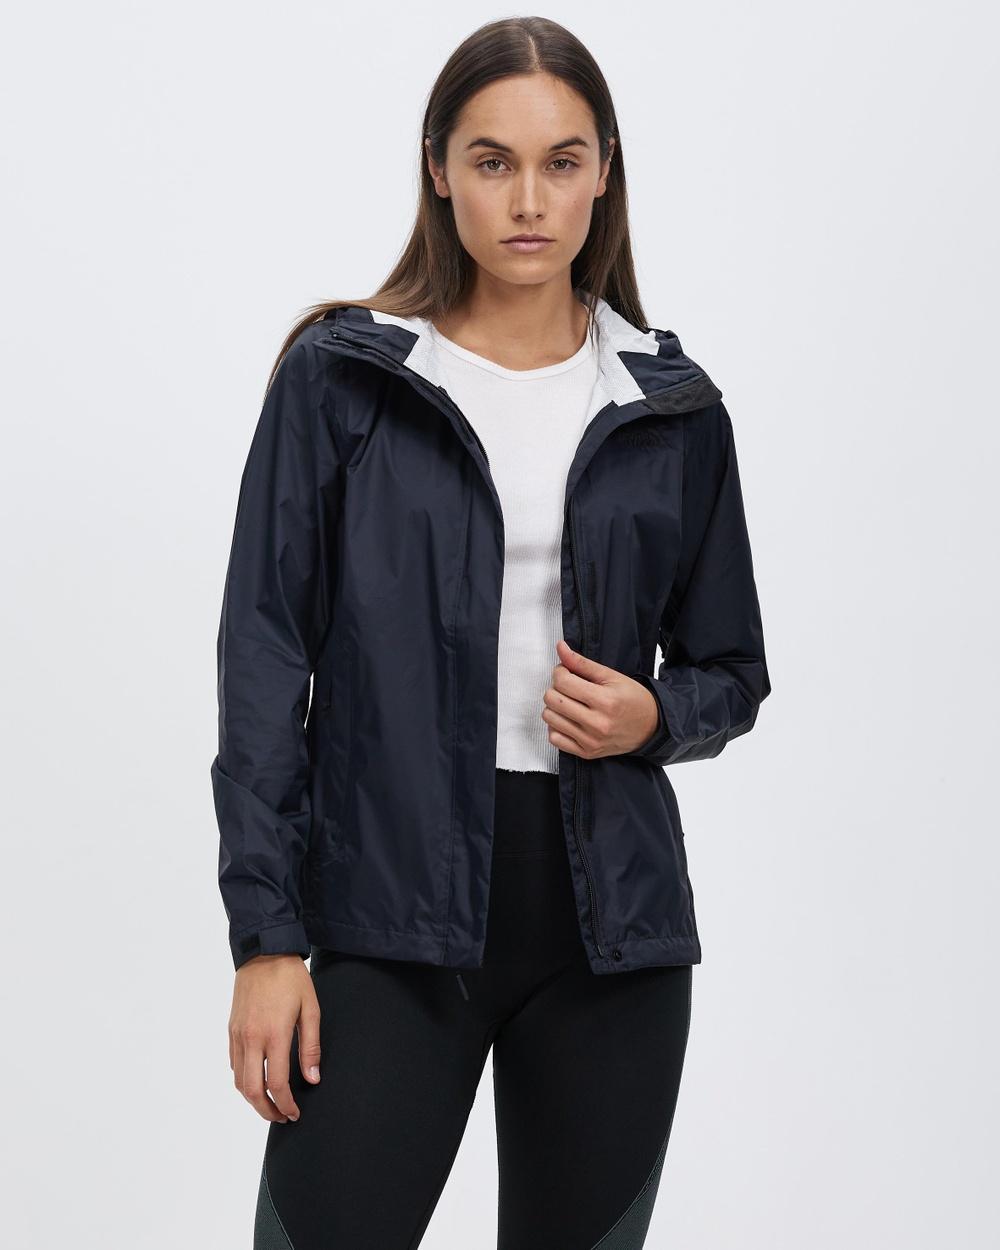 The North Face Venture 2 Jacket Women's Coats & Jackets Black